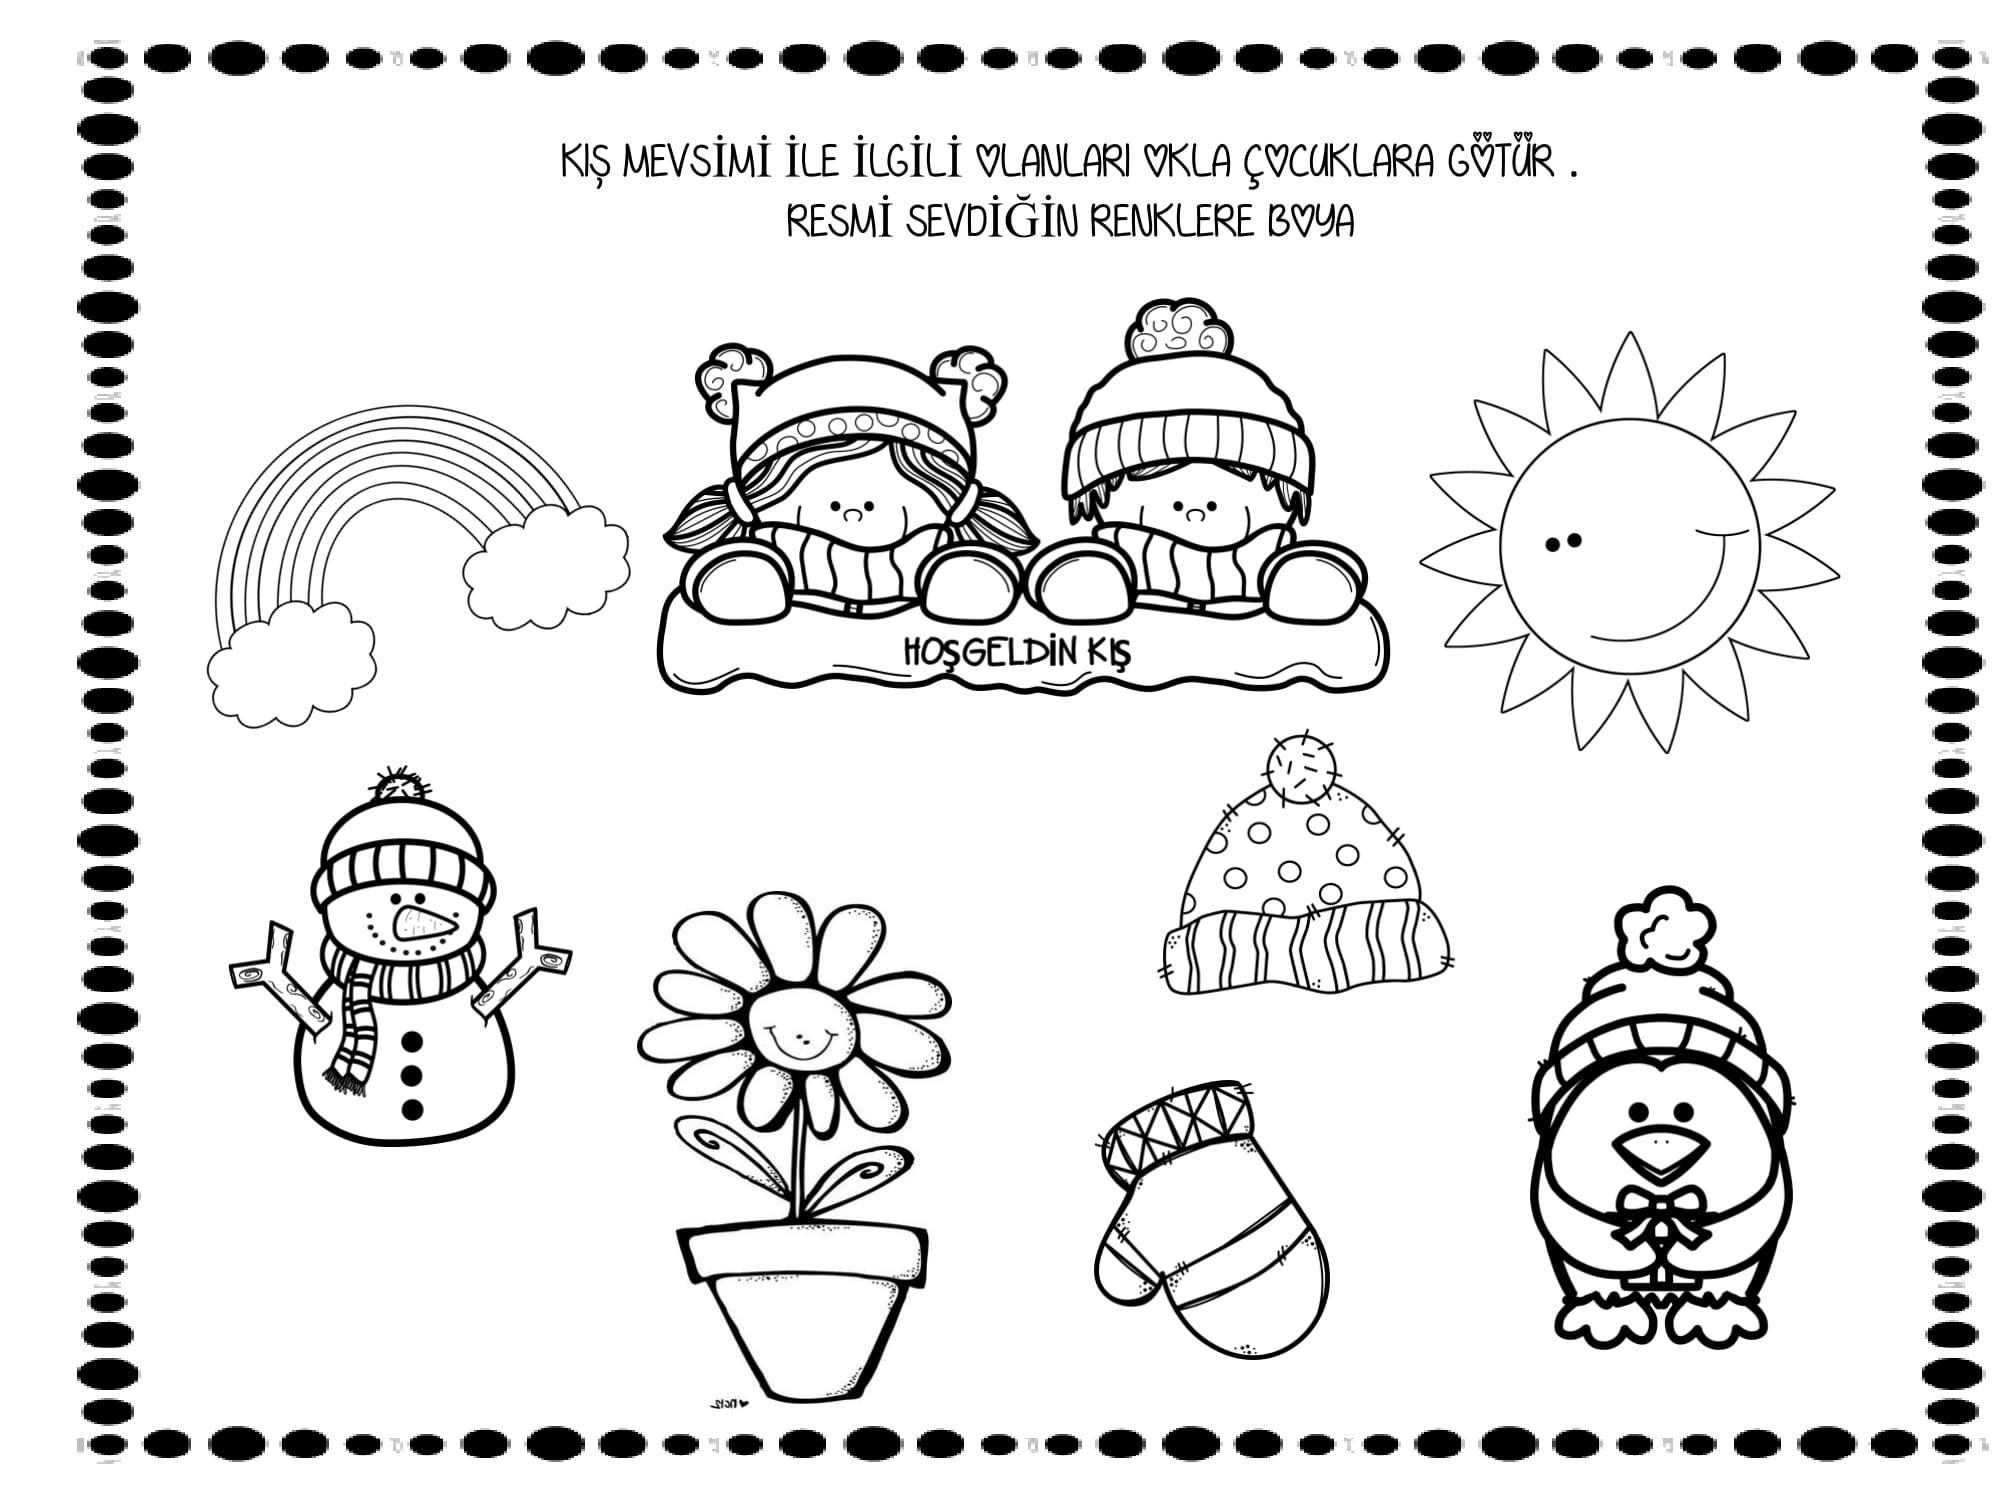 kış mevsimi | Mevsimler | Pinterest | Winter, Winter ...